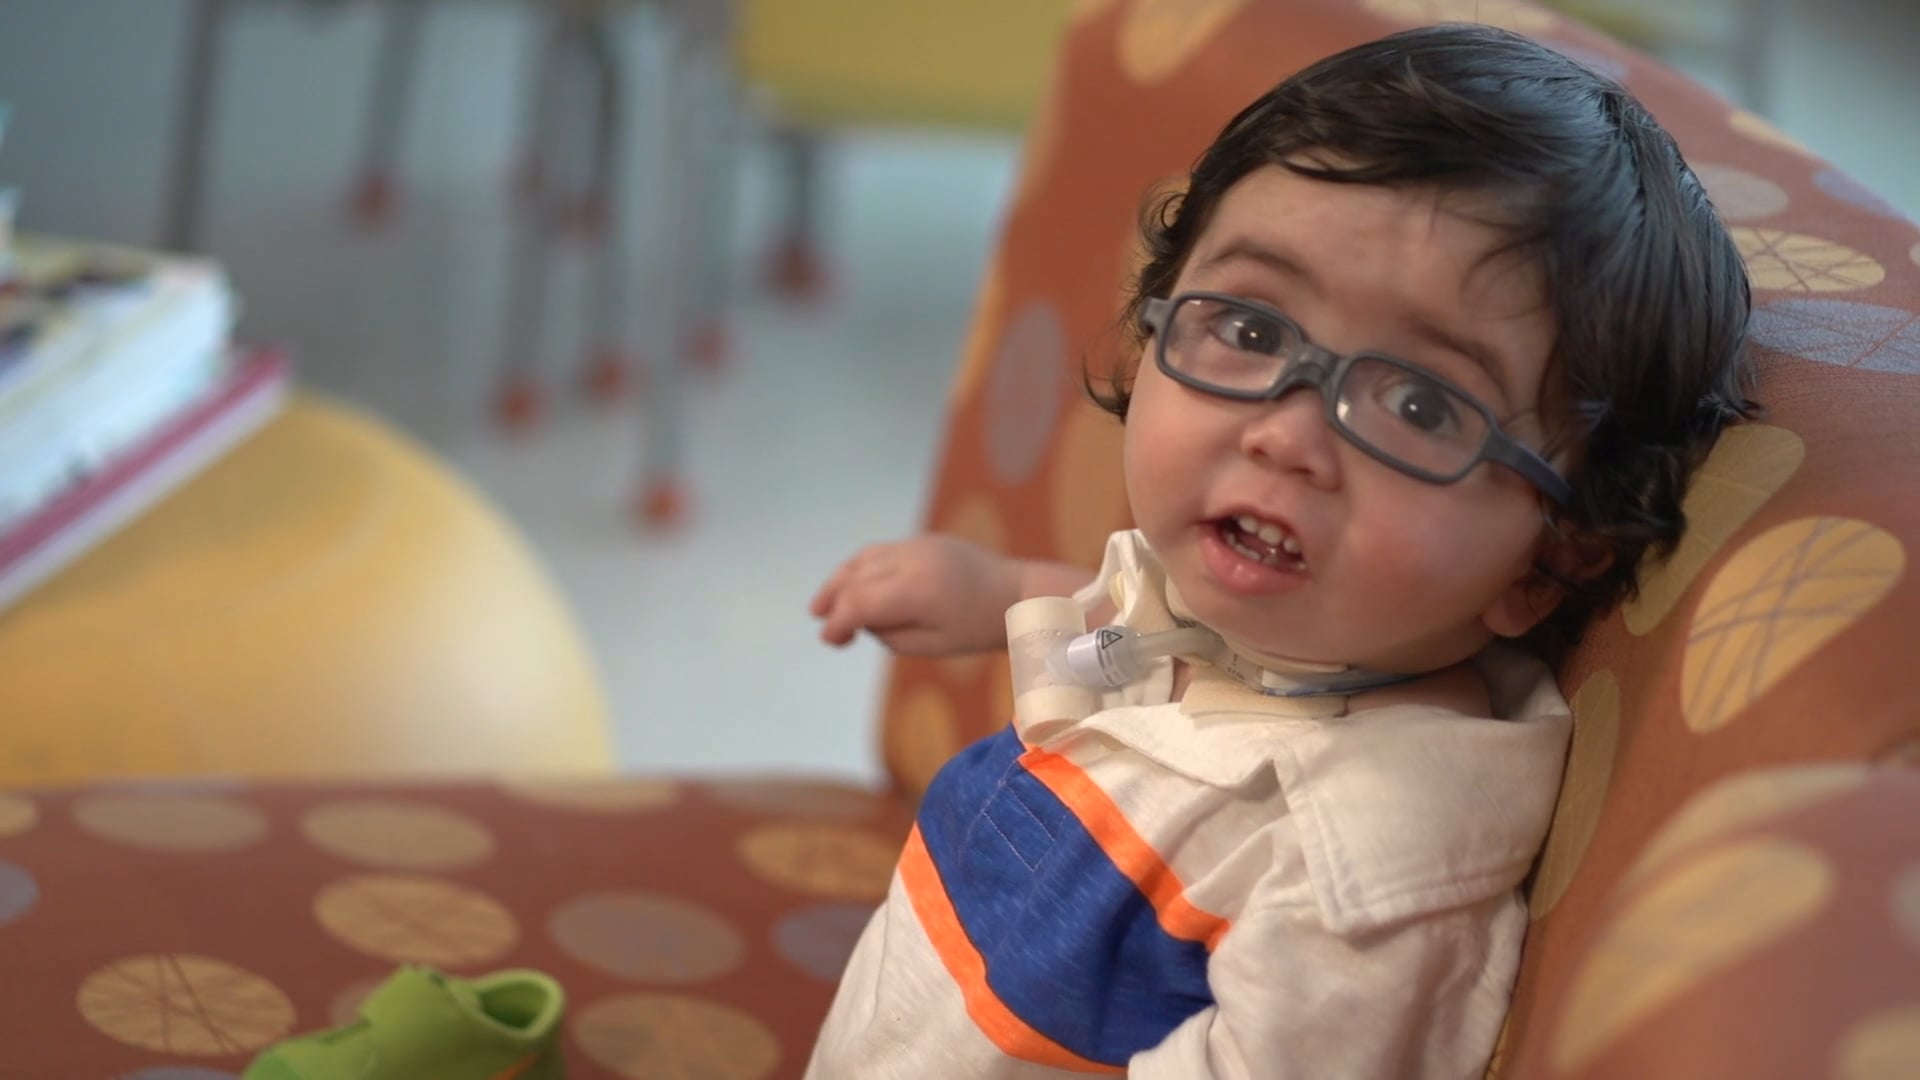 Johns Hopkins Children's Center Impact Video